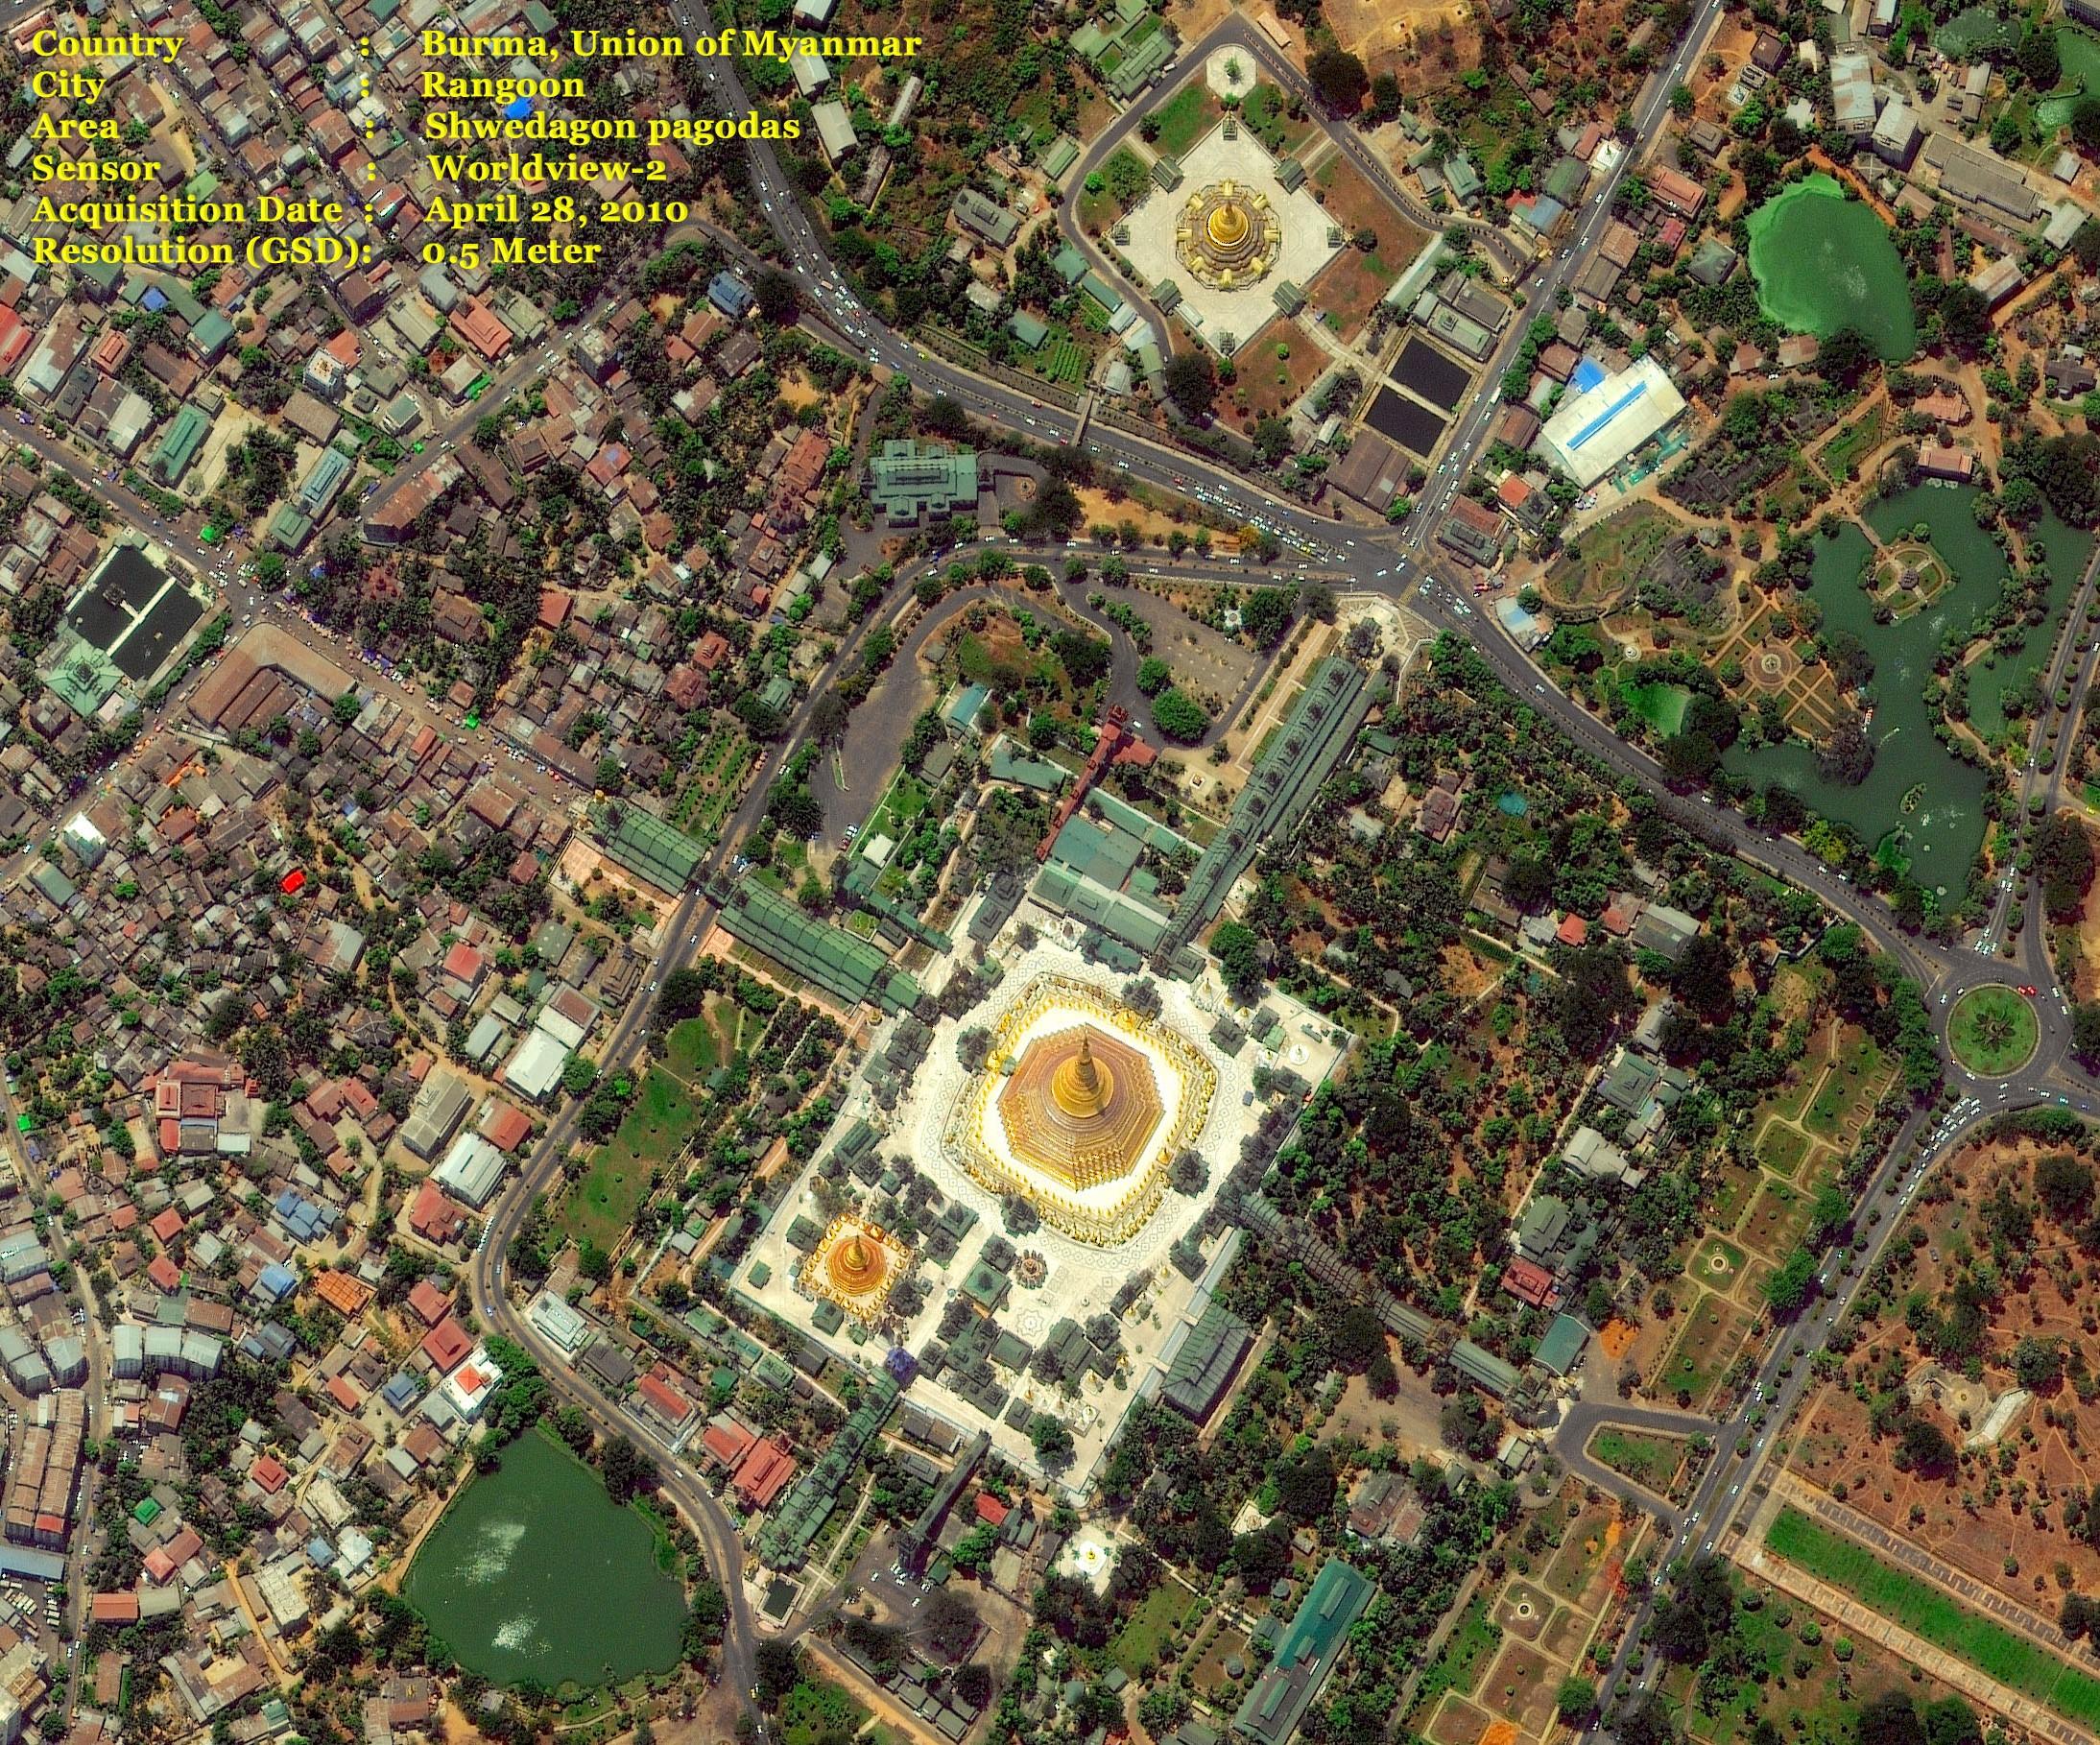 Burma, Ragoon, Myanmar  Shwedagon Pagodas